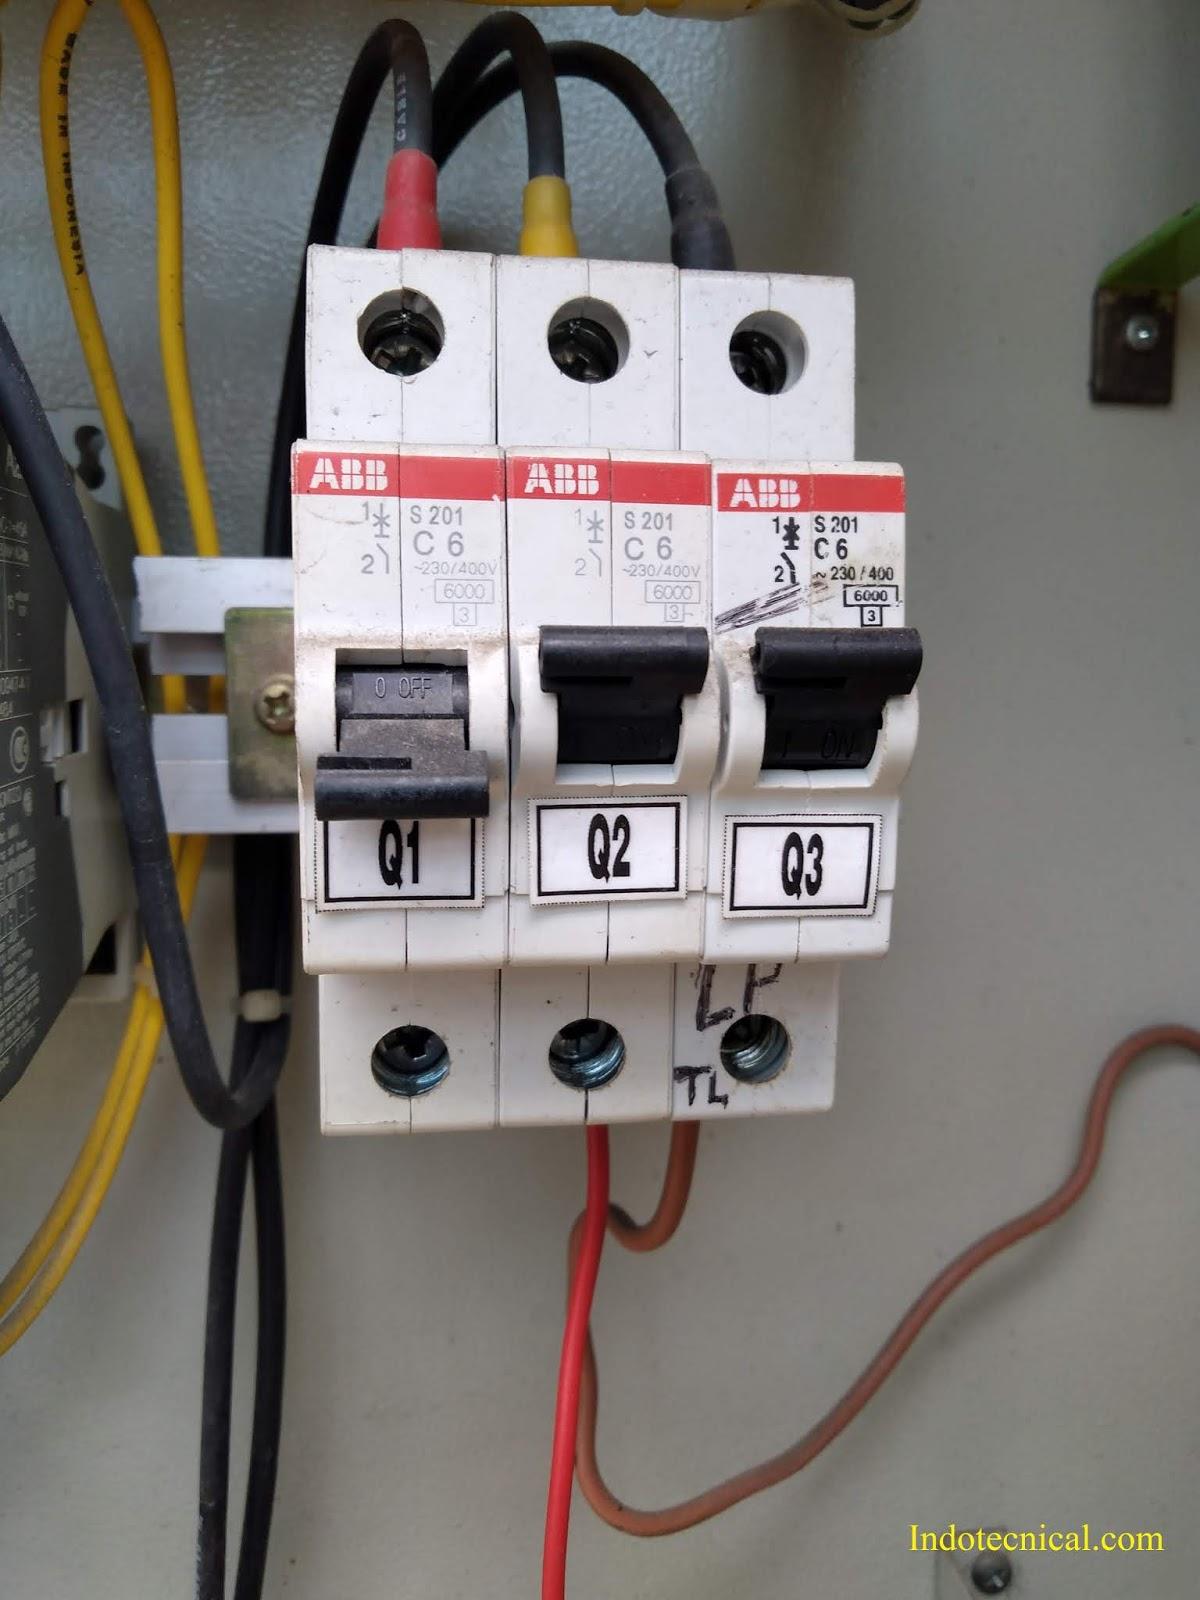 Tutorial Cara Memasang Timer Theben Untuk Lampu Otomatis